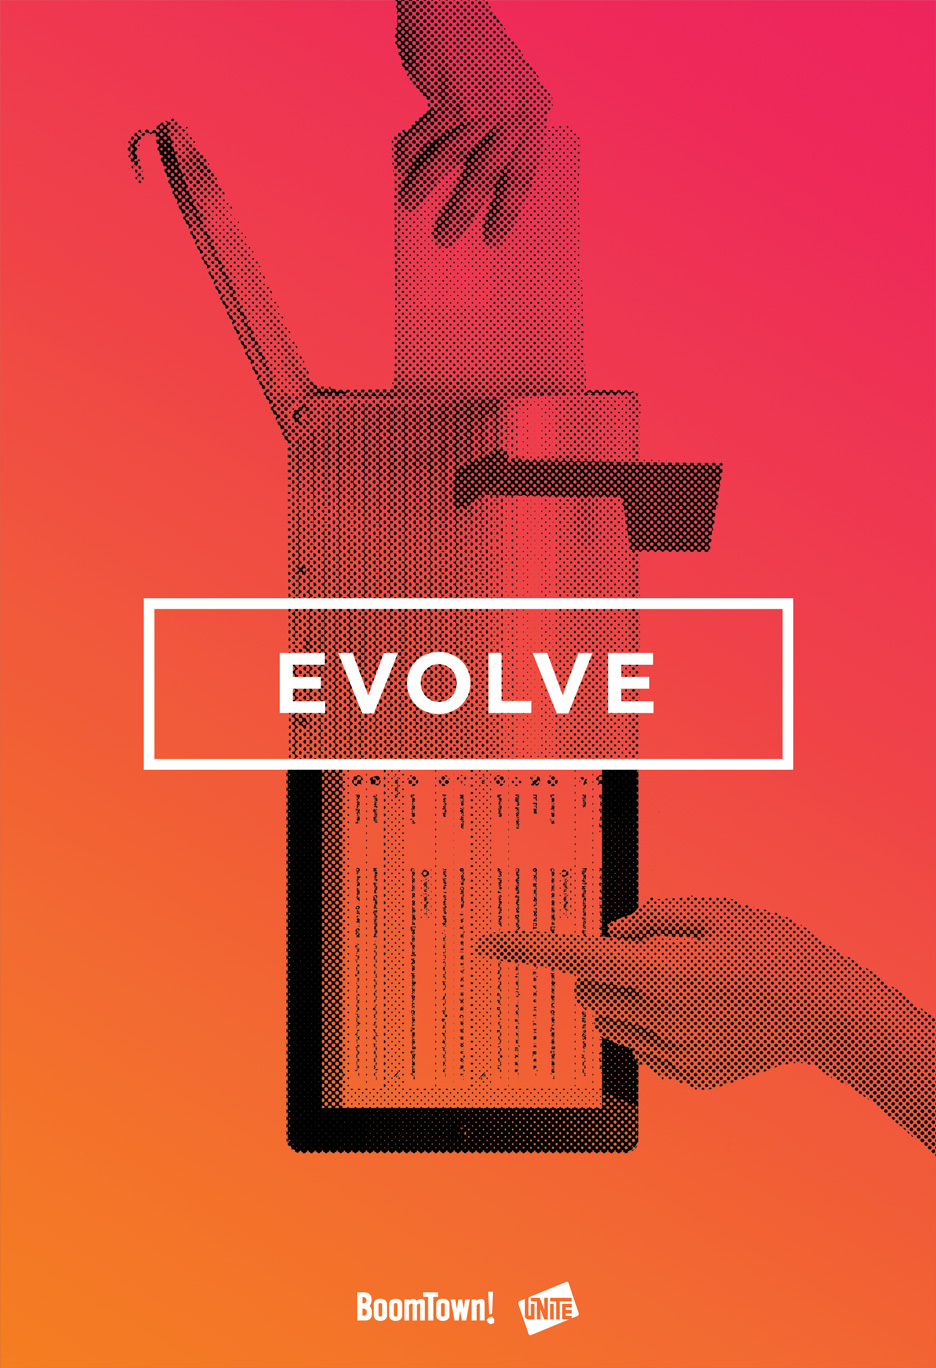 evolve-4.jpg